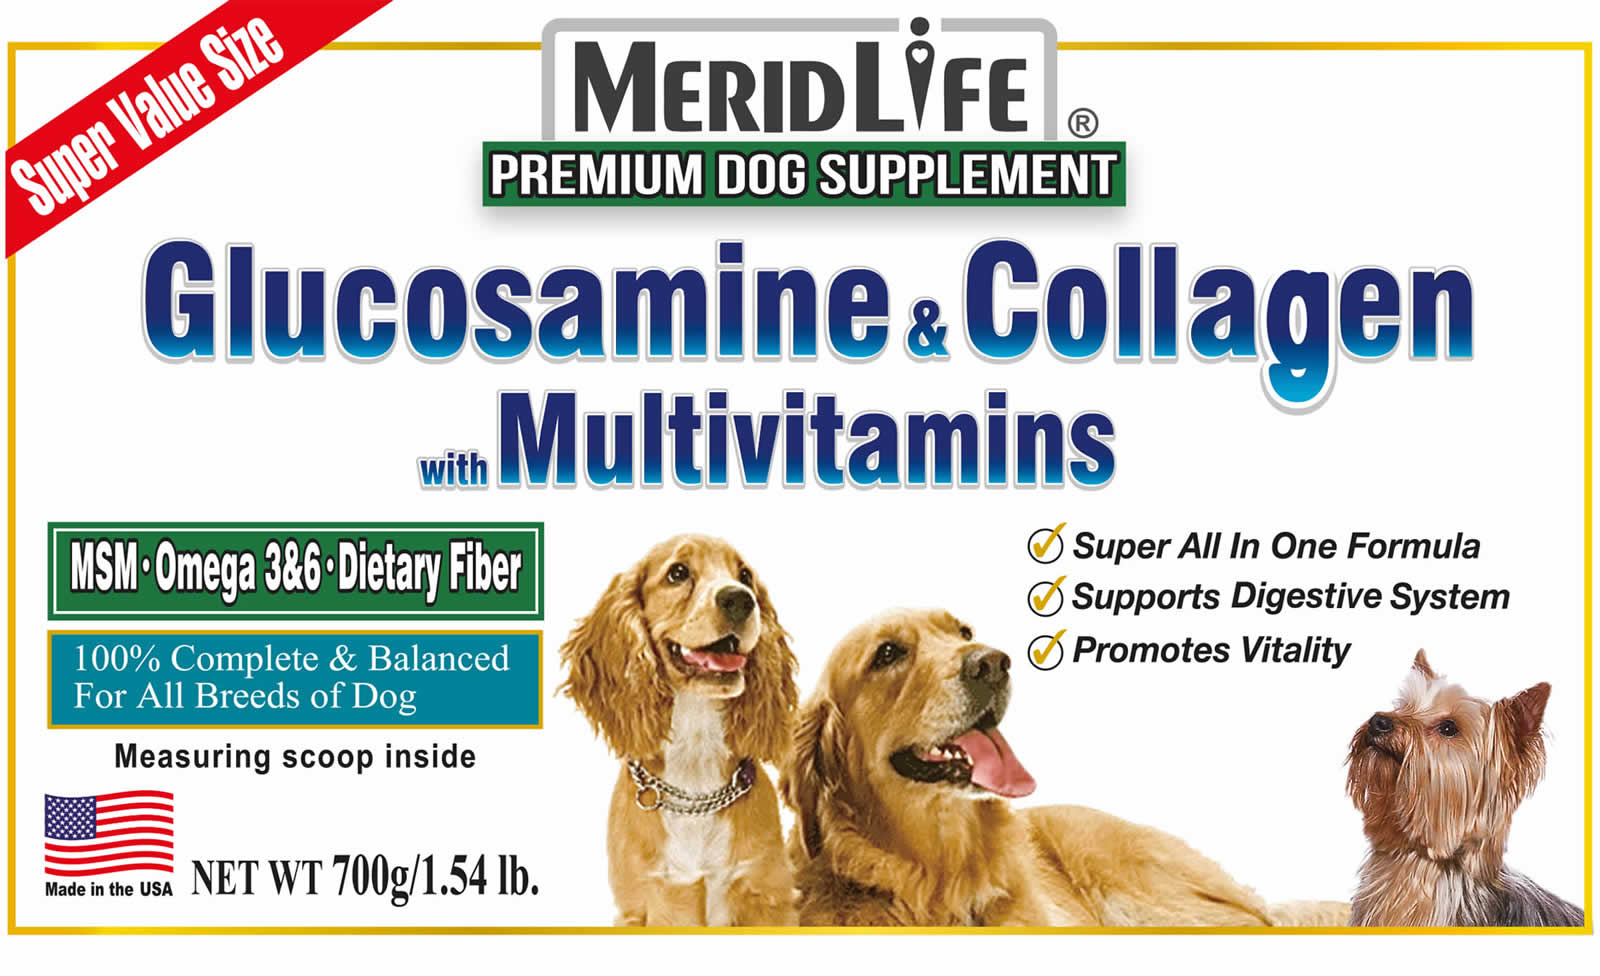 Glucosamine & Collagen with Multivitamin Supplement Facts